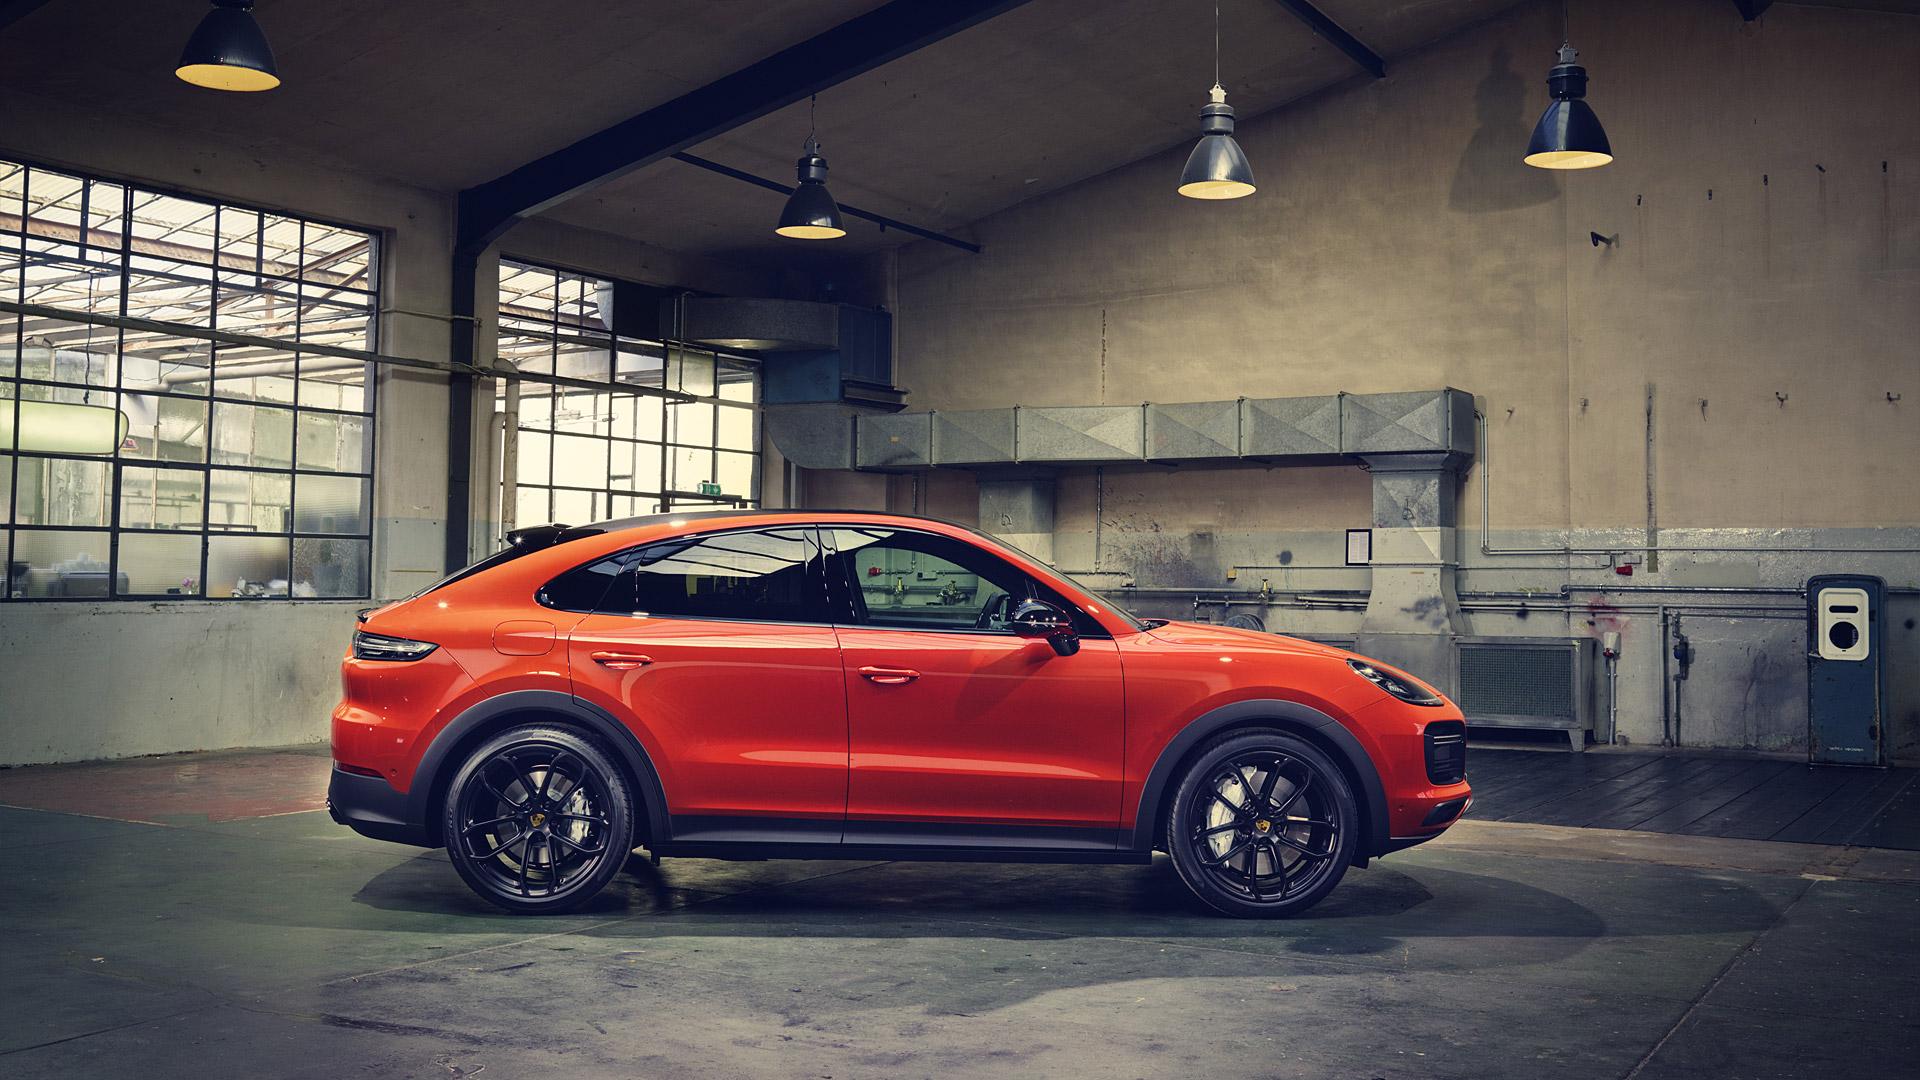 2020 Porsche Cayenne Turbo Coupe Wallpapers Specs Videos   4K 1920x1080